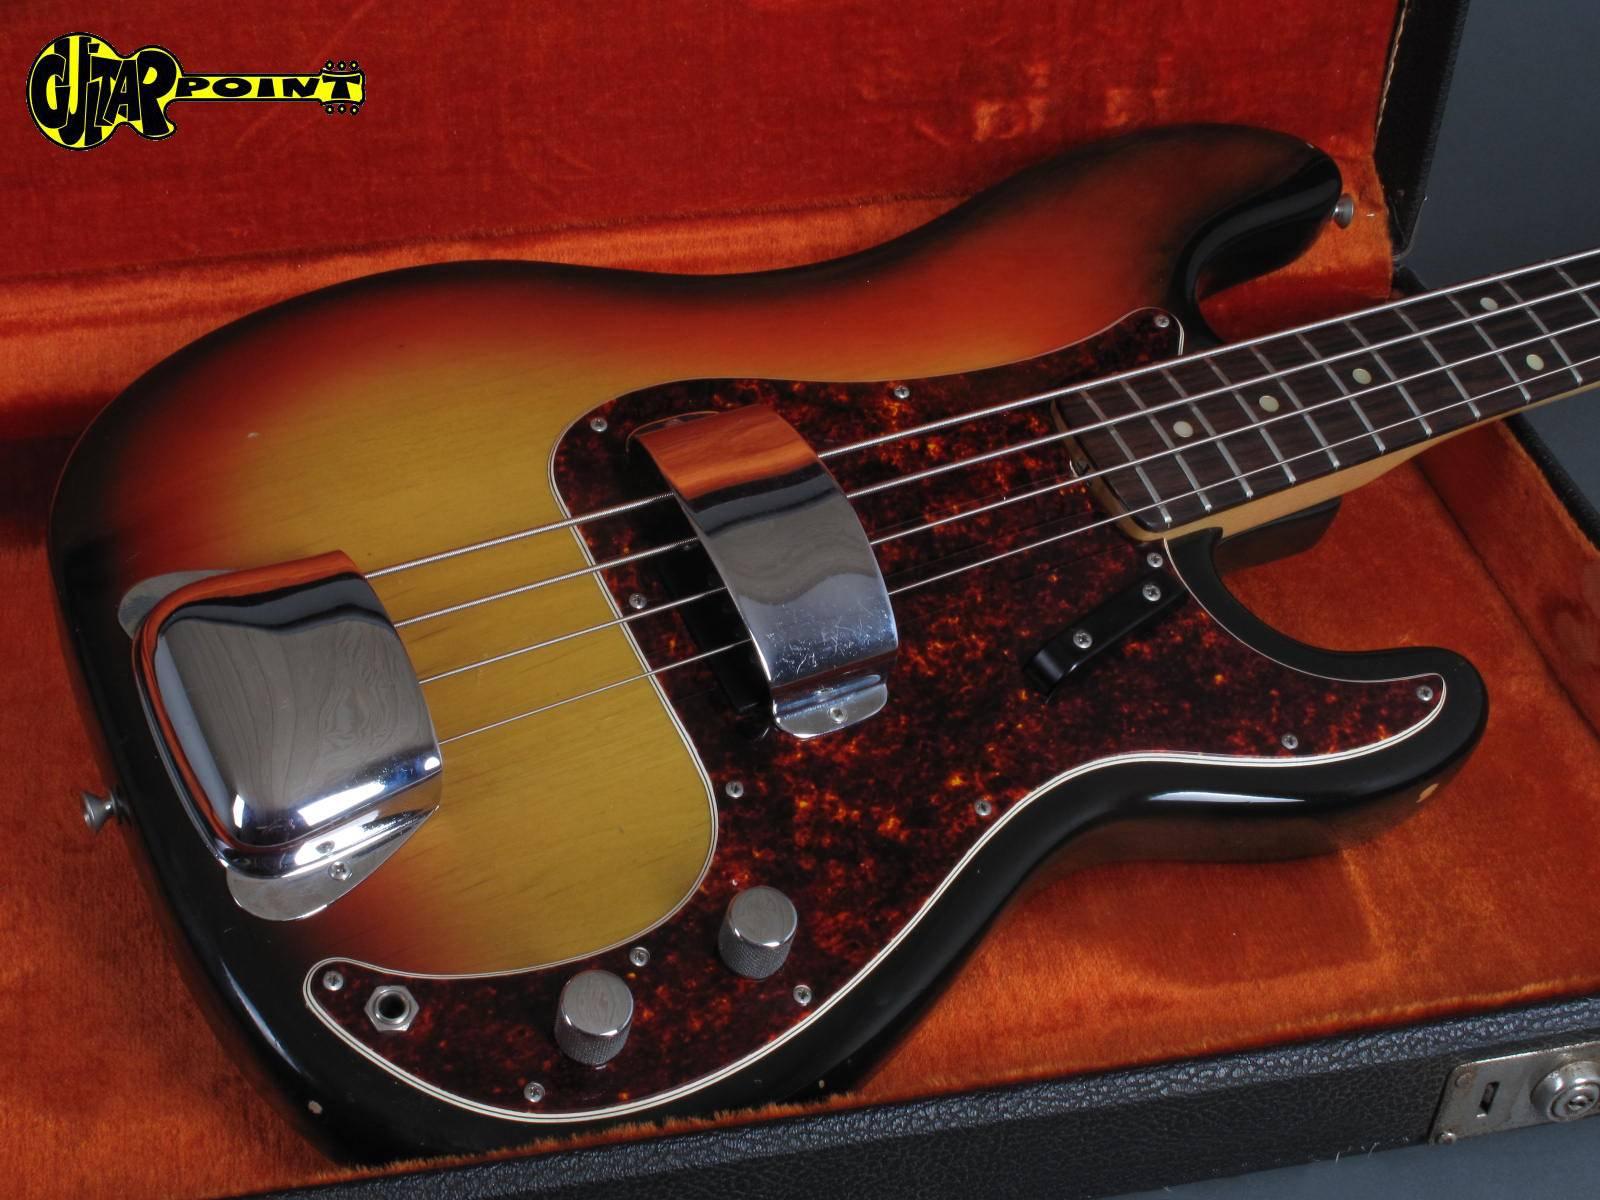 fender precision p bass 1971 3 tone sunburst bass for sale guitarpoint. Black Bedroom Furniture Sets. Home Design Ideas